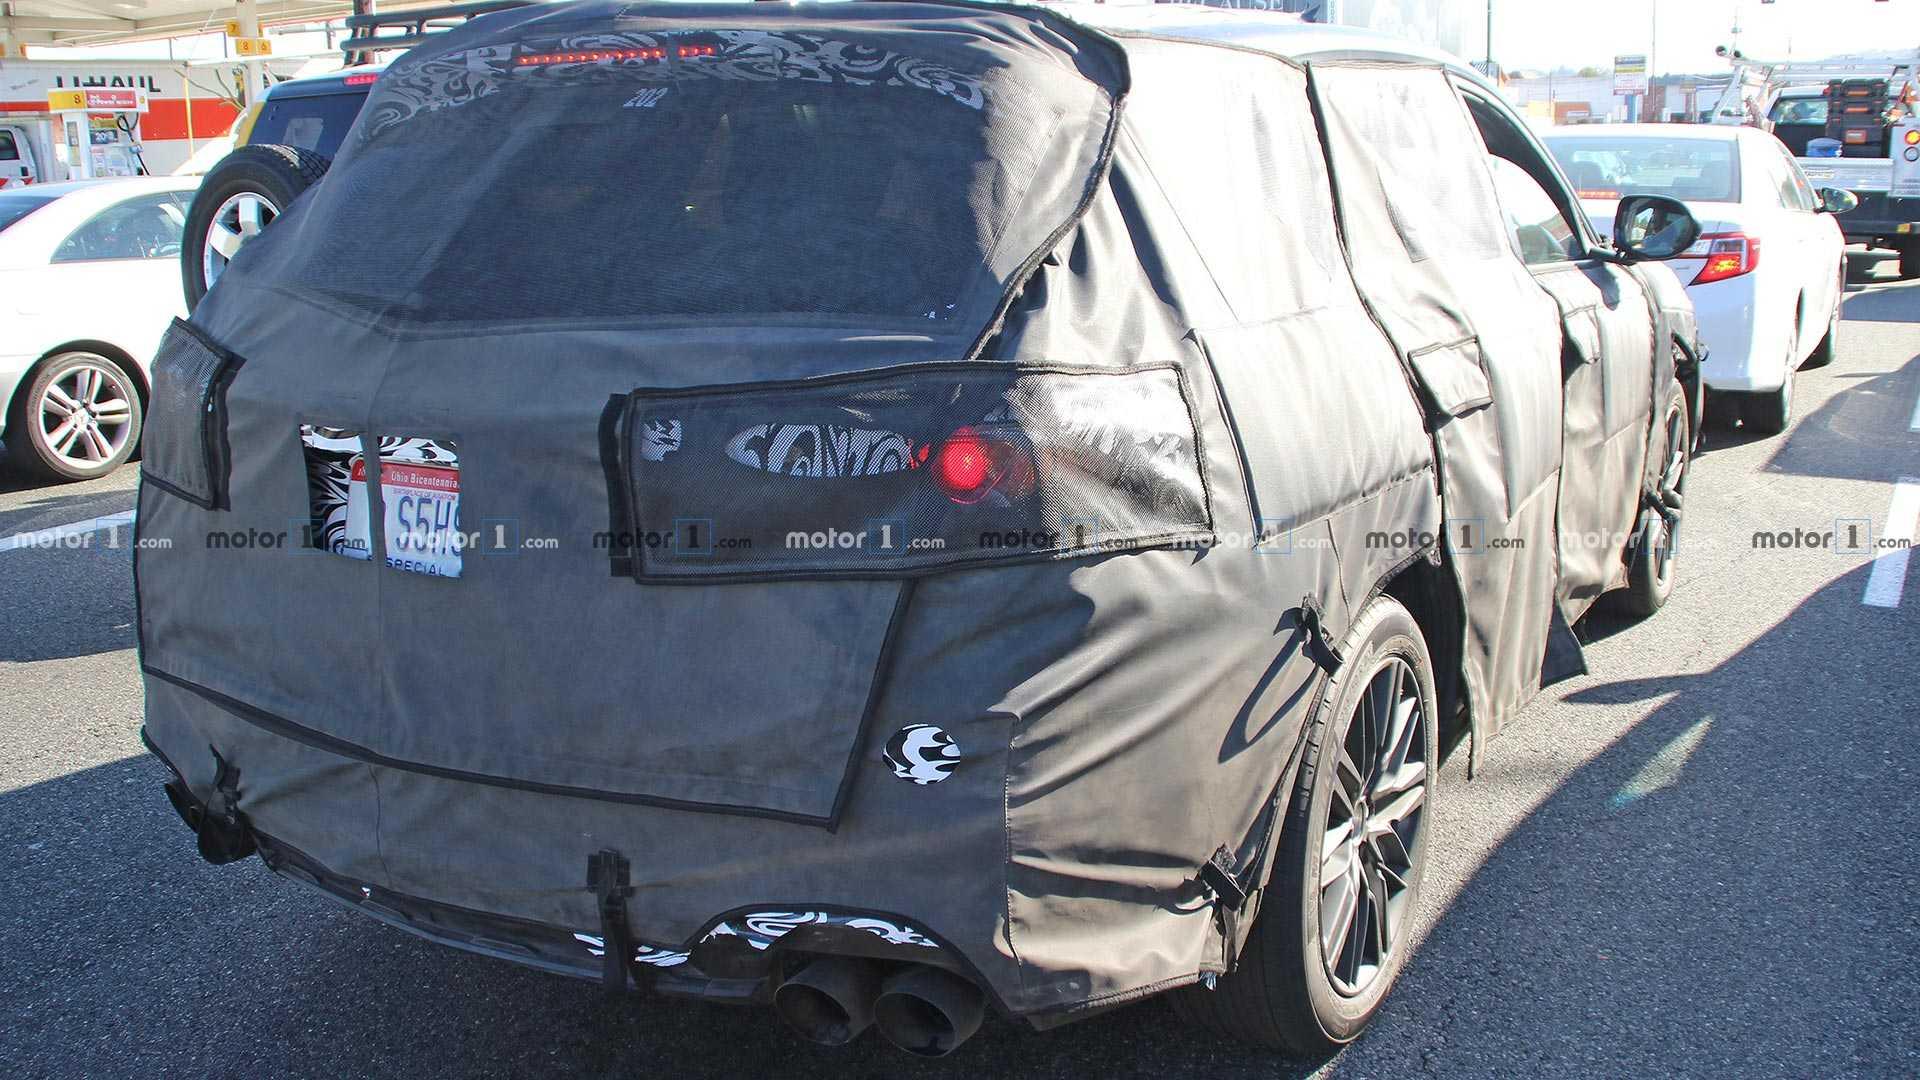 72 All New 2020 Acura Mdx Spy Shots Performance for 2020 Acura Mdx Spy Shots